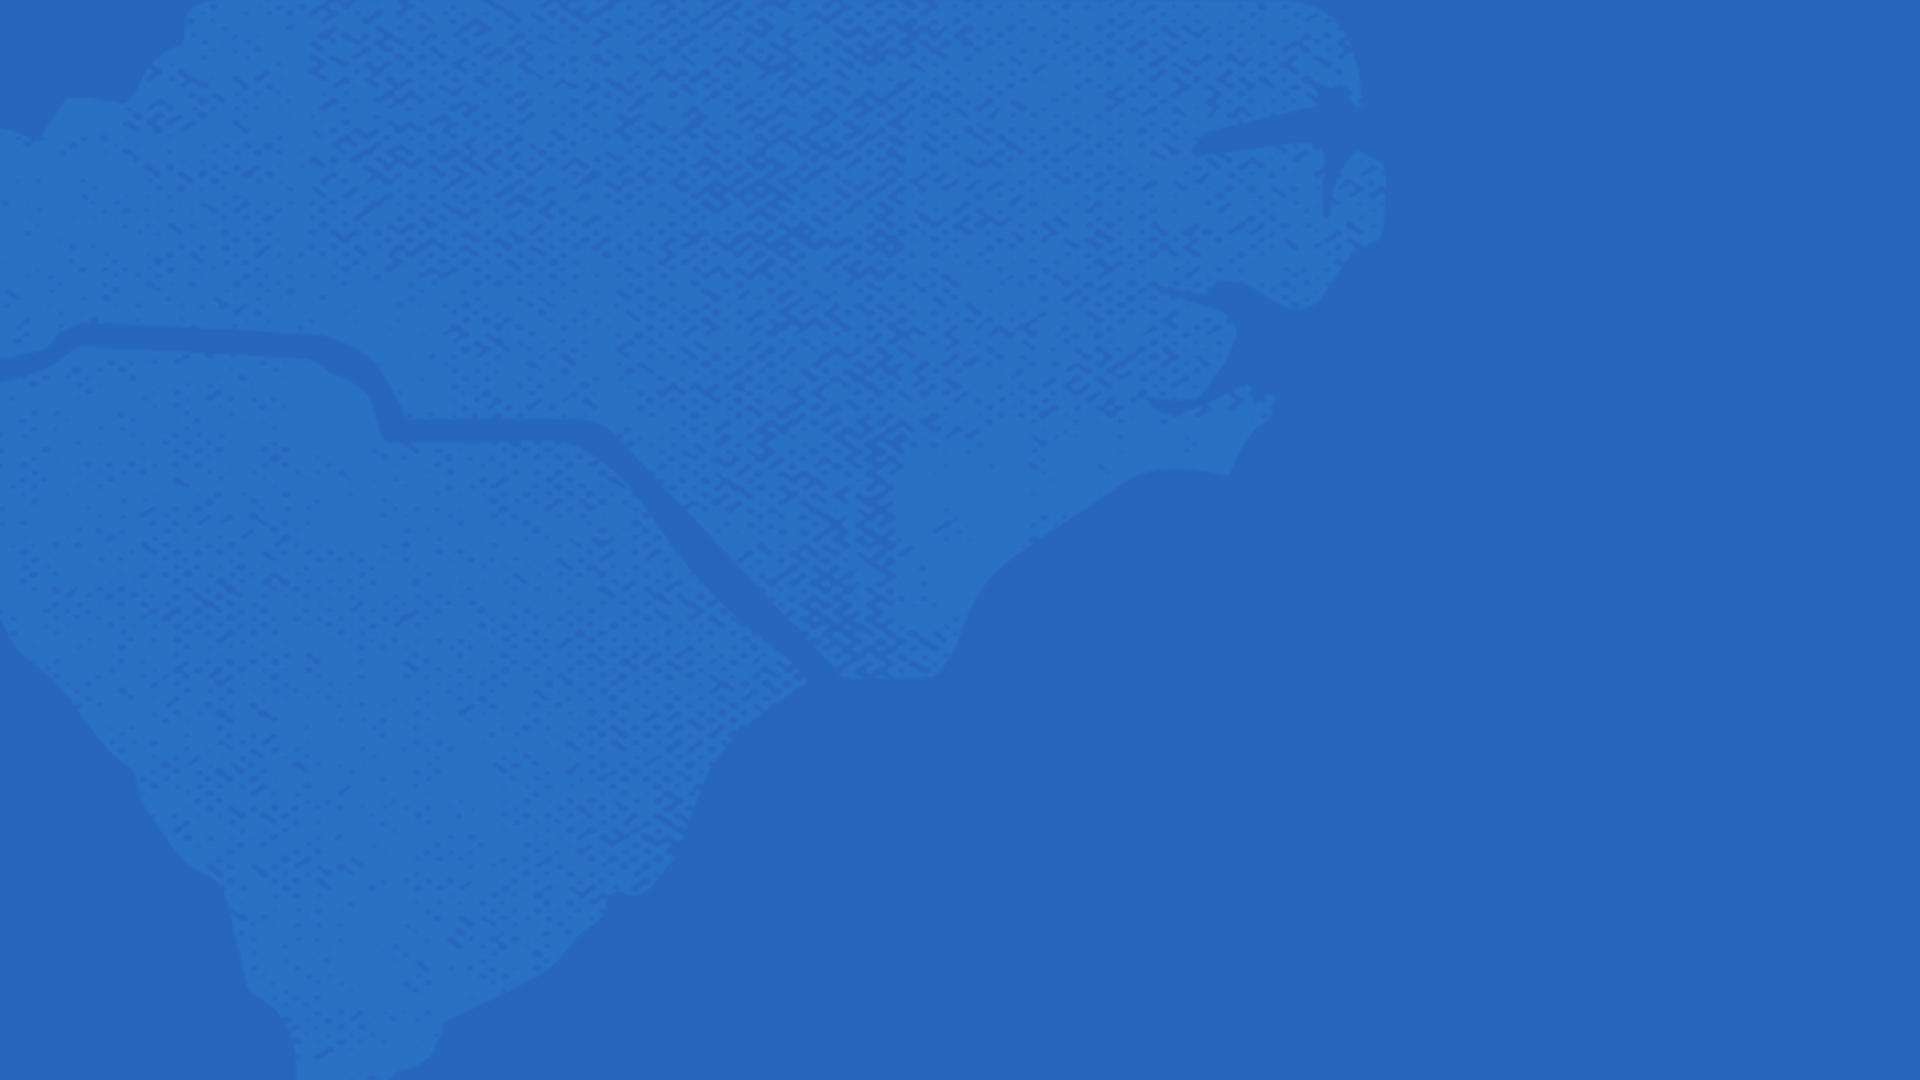 Blue Outline of North and South Carolina